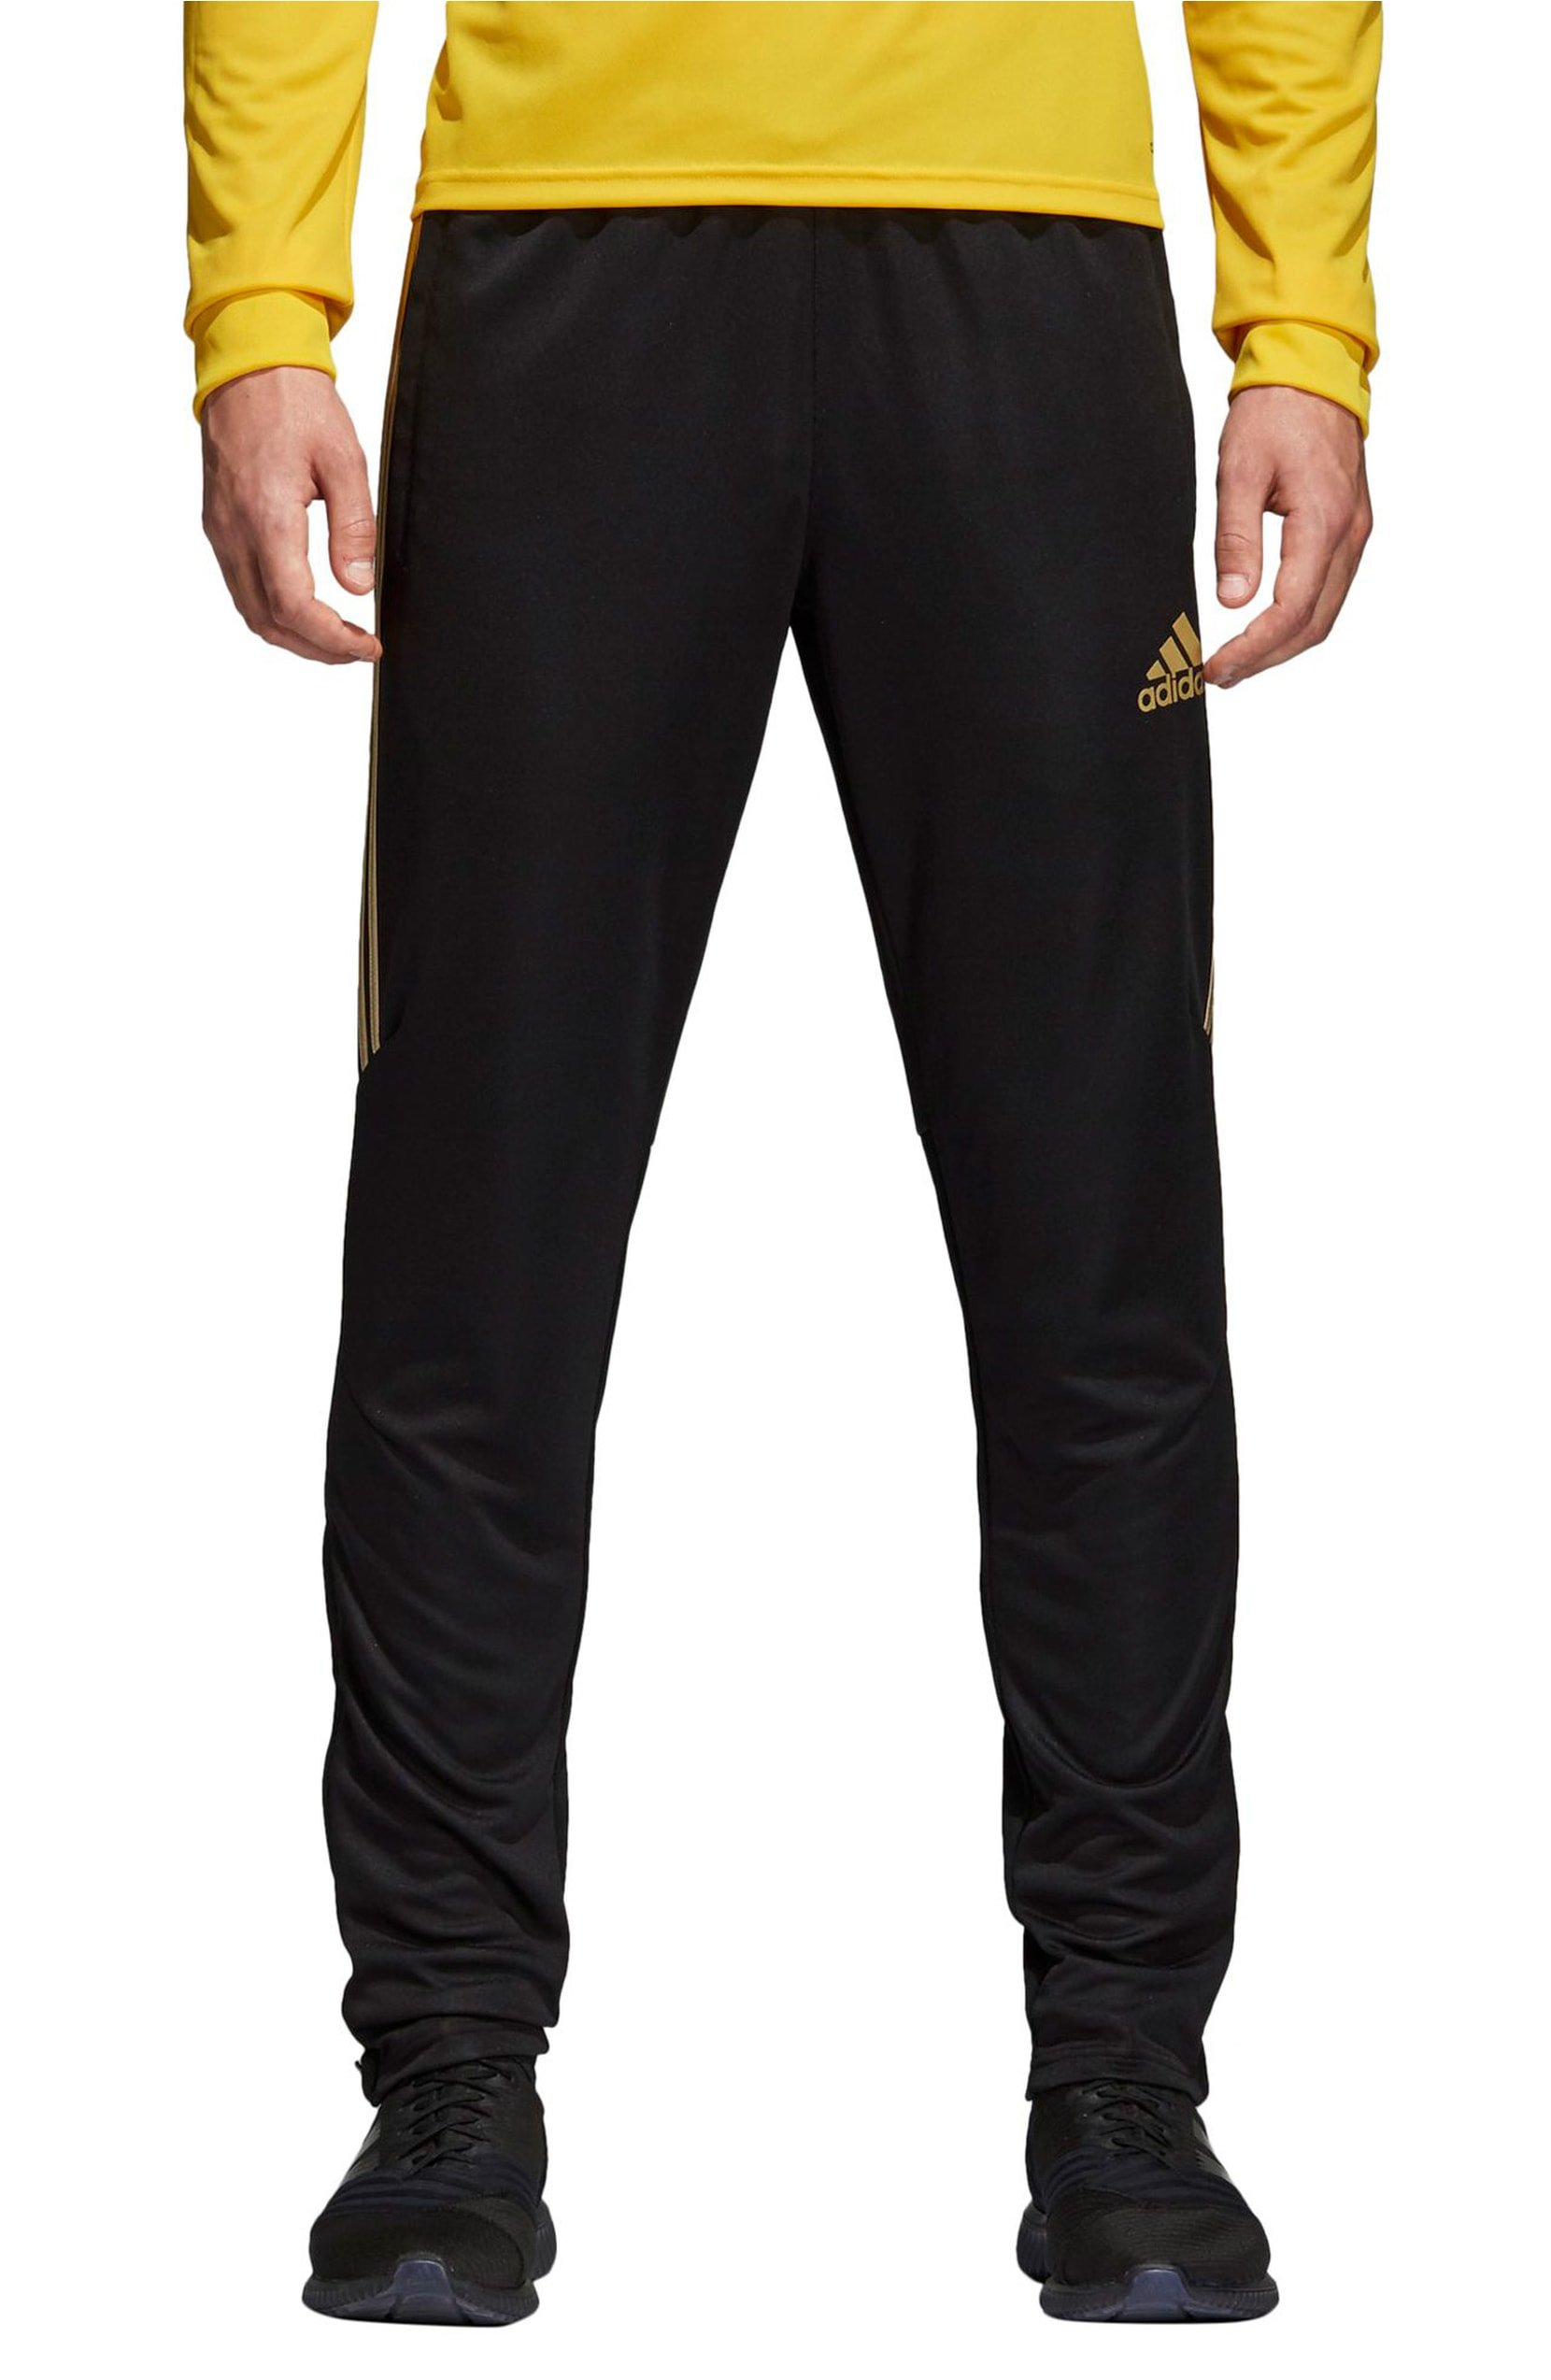 bff61335e Galleon - Adidas Men's Tiro '17 Pants Black/Metallic Gold Medium 31